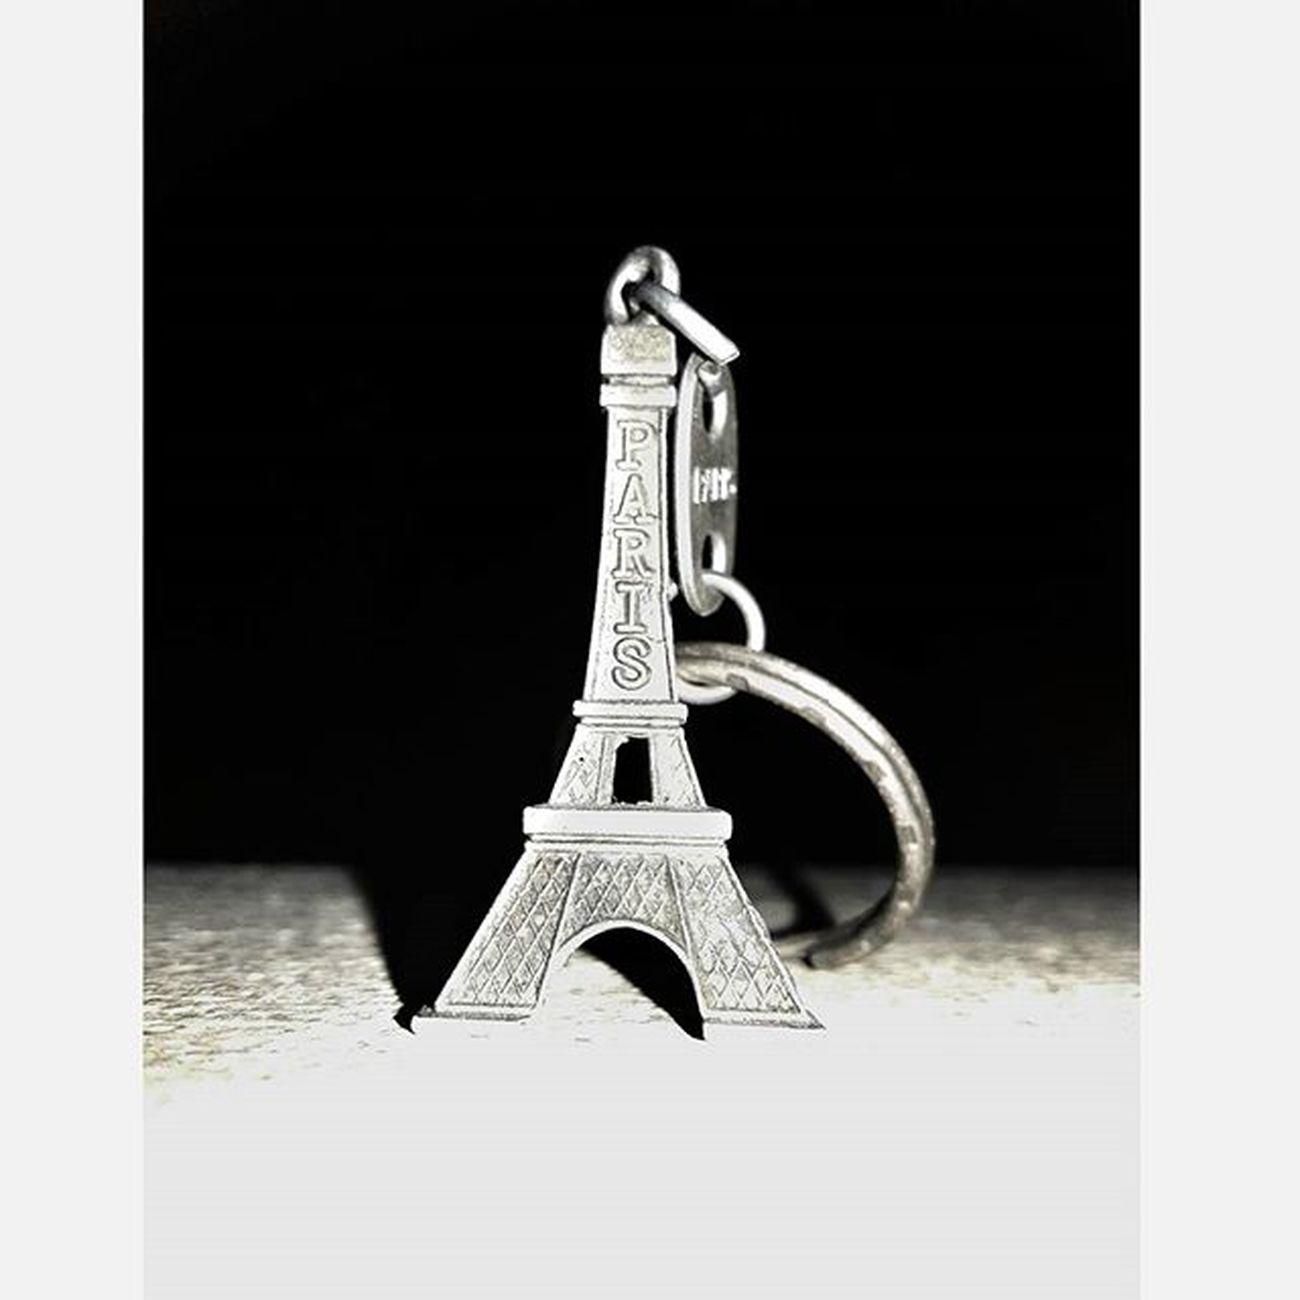 """Its the little things that make life big."" Instapic Instamood Eiffeltower Keyring Photography Snapspeed Igersmauritius"